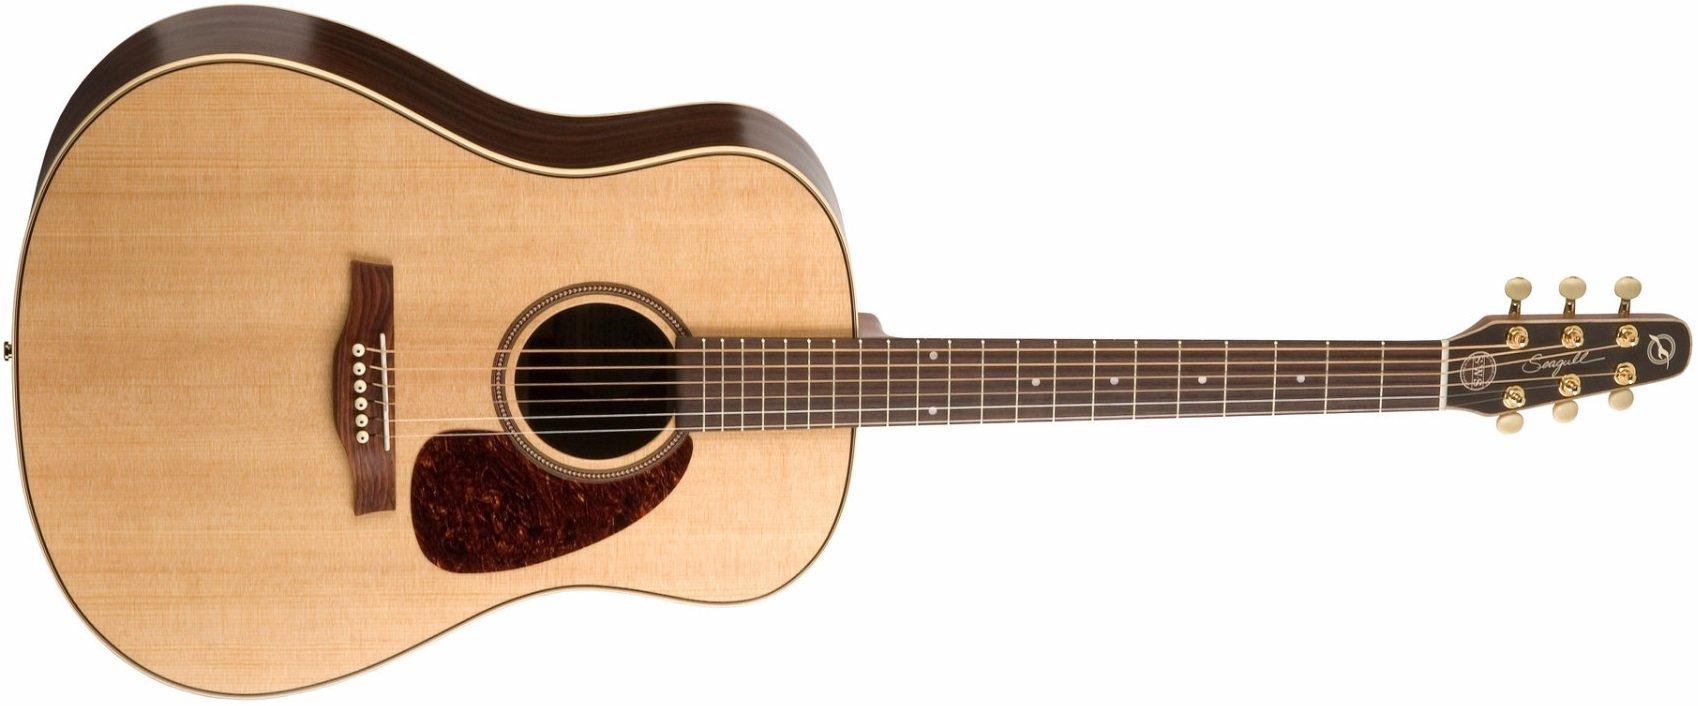 Seagull Maritime SWS Rosewood SG Acoustic Guitar